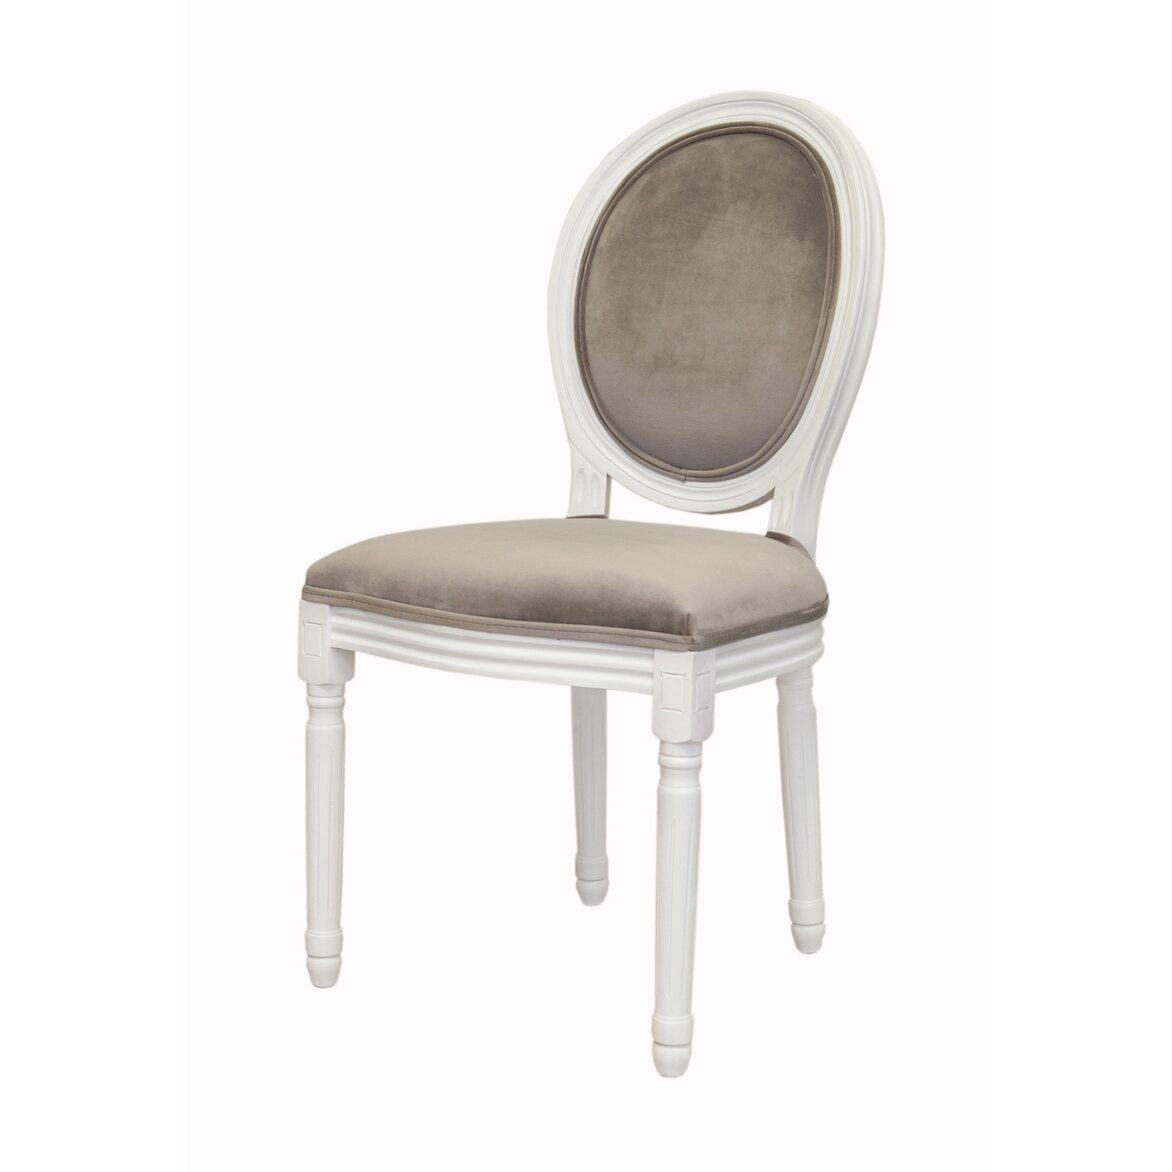 Стул Volker taupe 4 | Обеденные стулья Kingsby